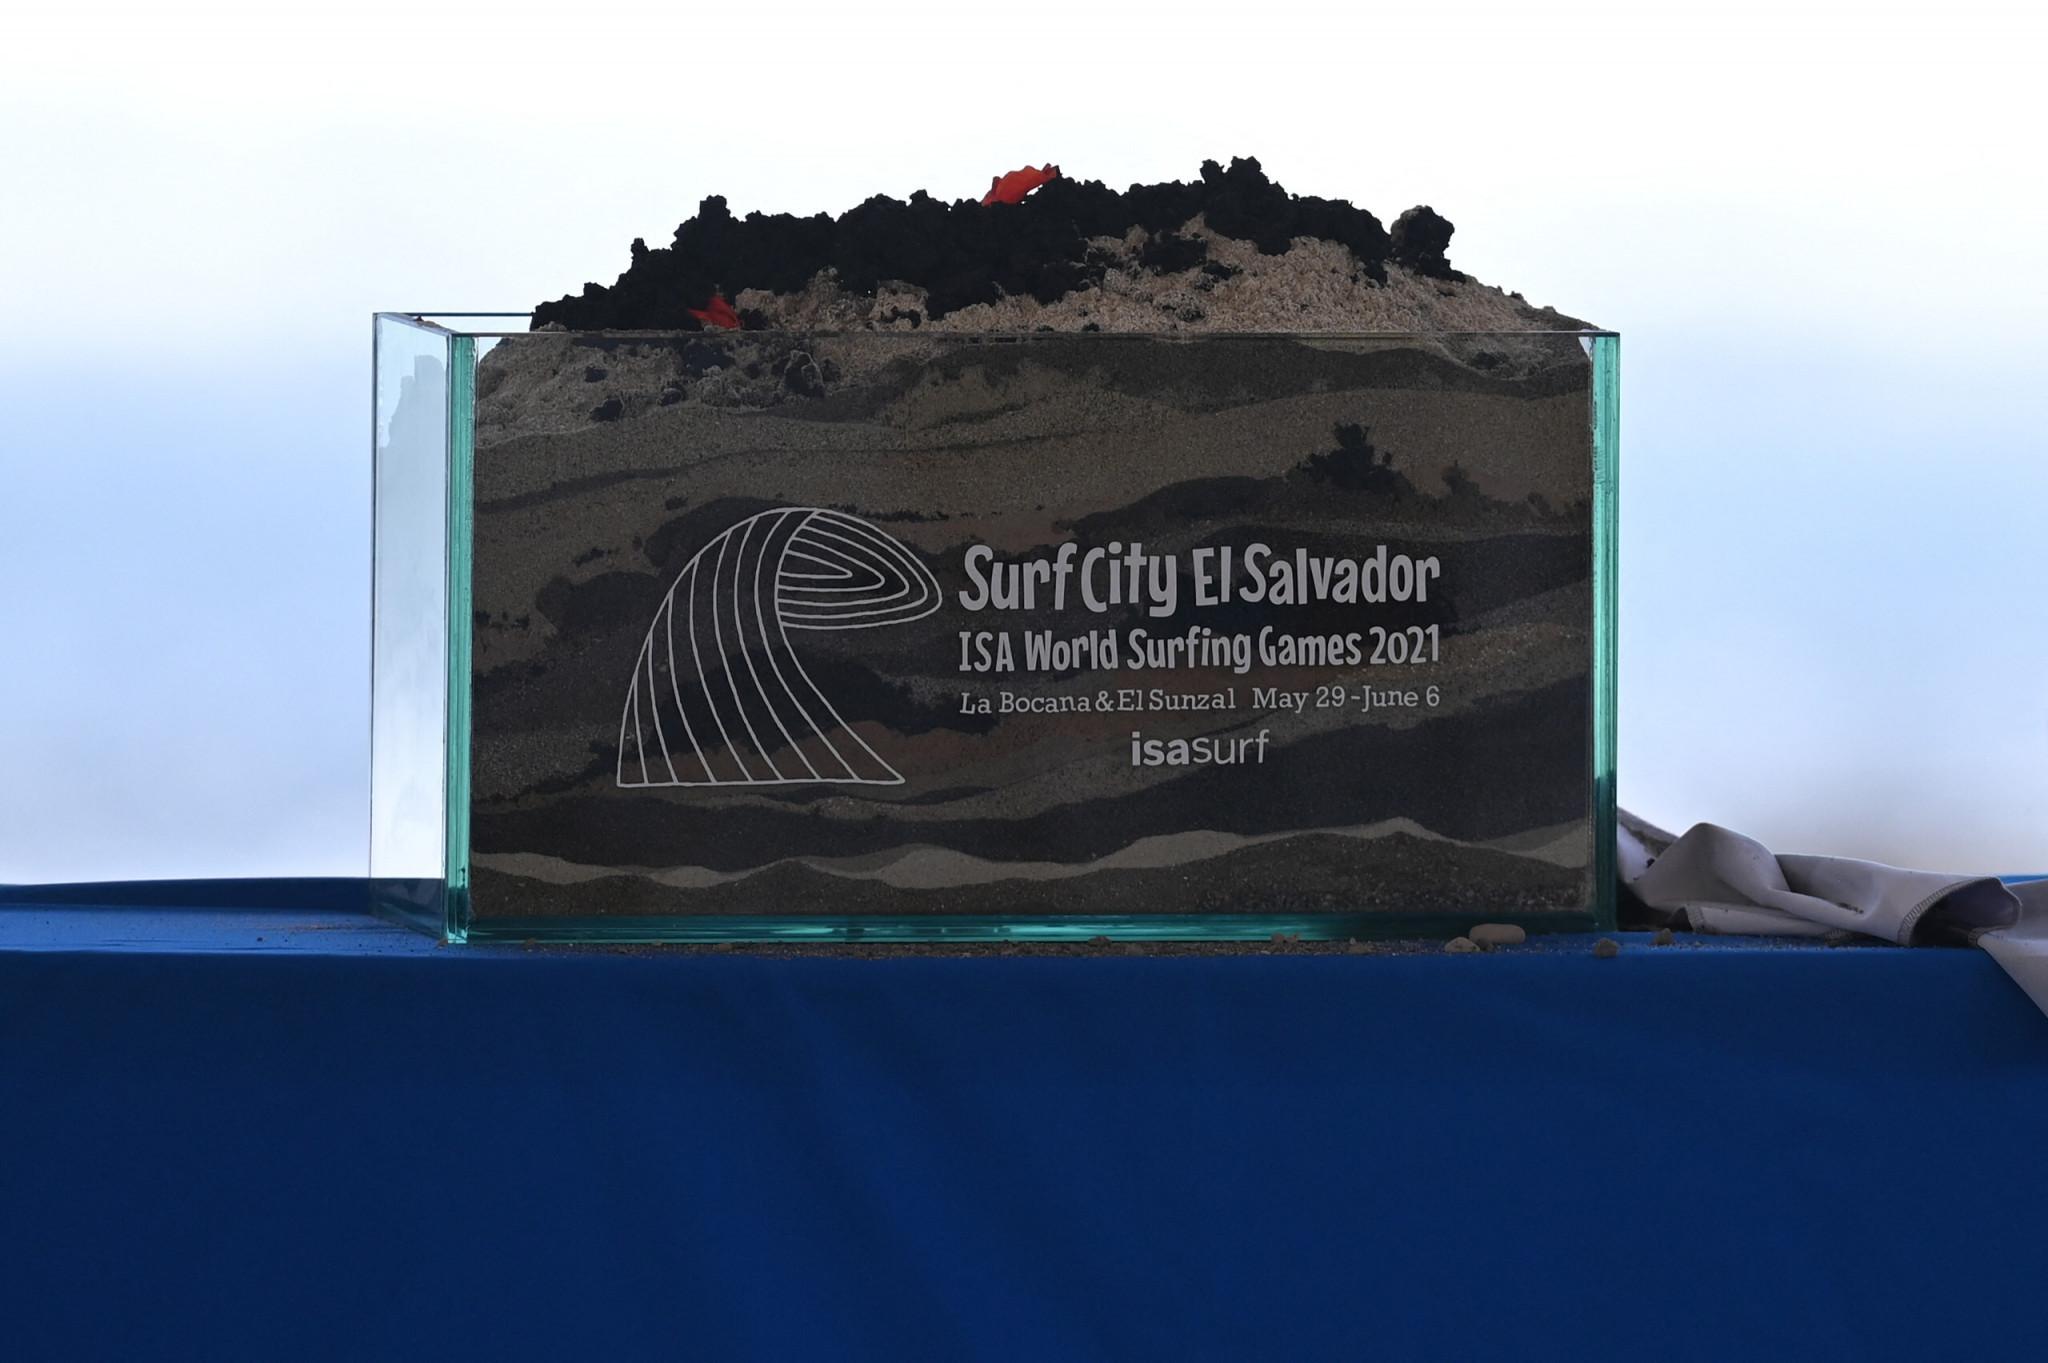 El Salvador to host 2023 World Surfing Games